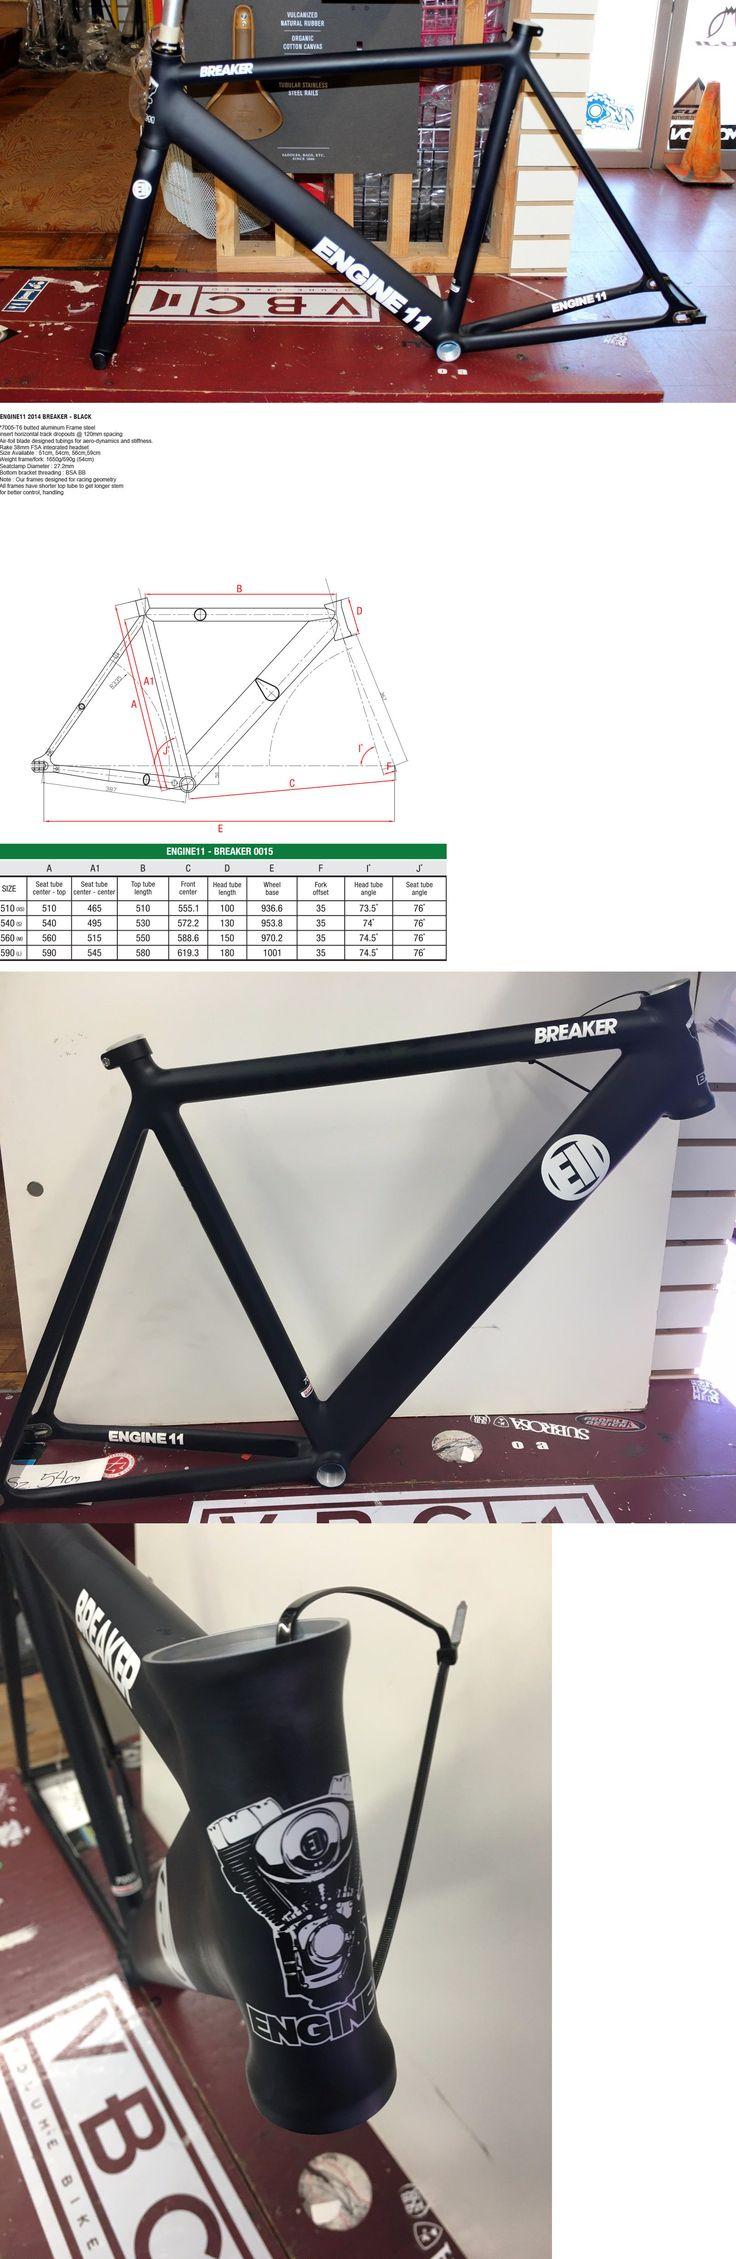 Bicycle Frames 22679: New 2014 Engine11 Breaker Frame Set 54Cm Blue Track Bicycle Frame Columbus Fork -> BUY IT NOW ONLY: $529.99 on eBay!